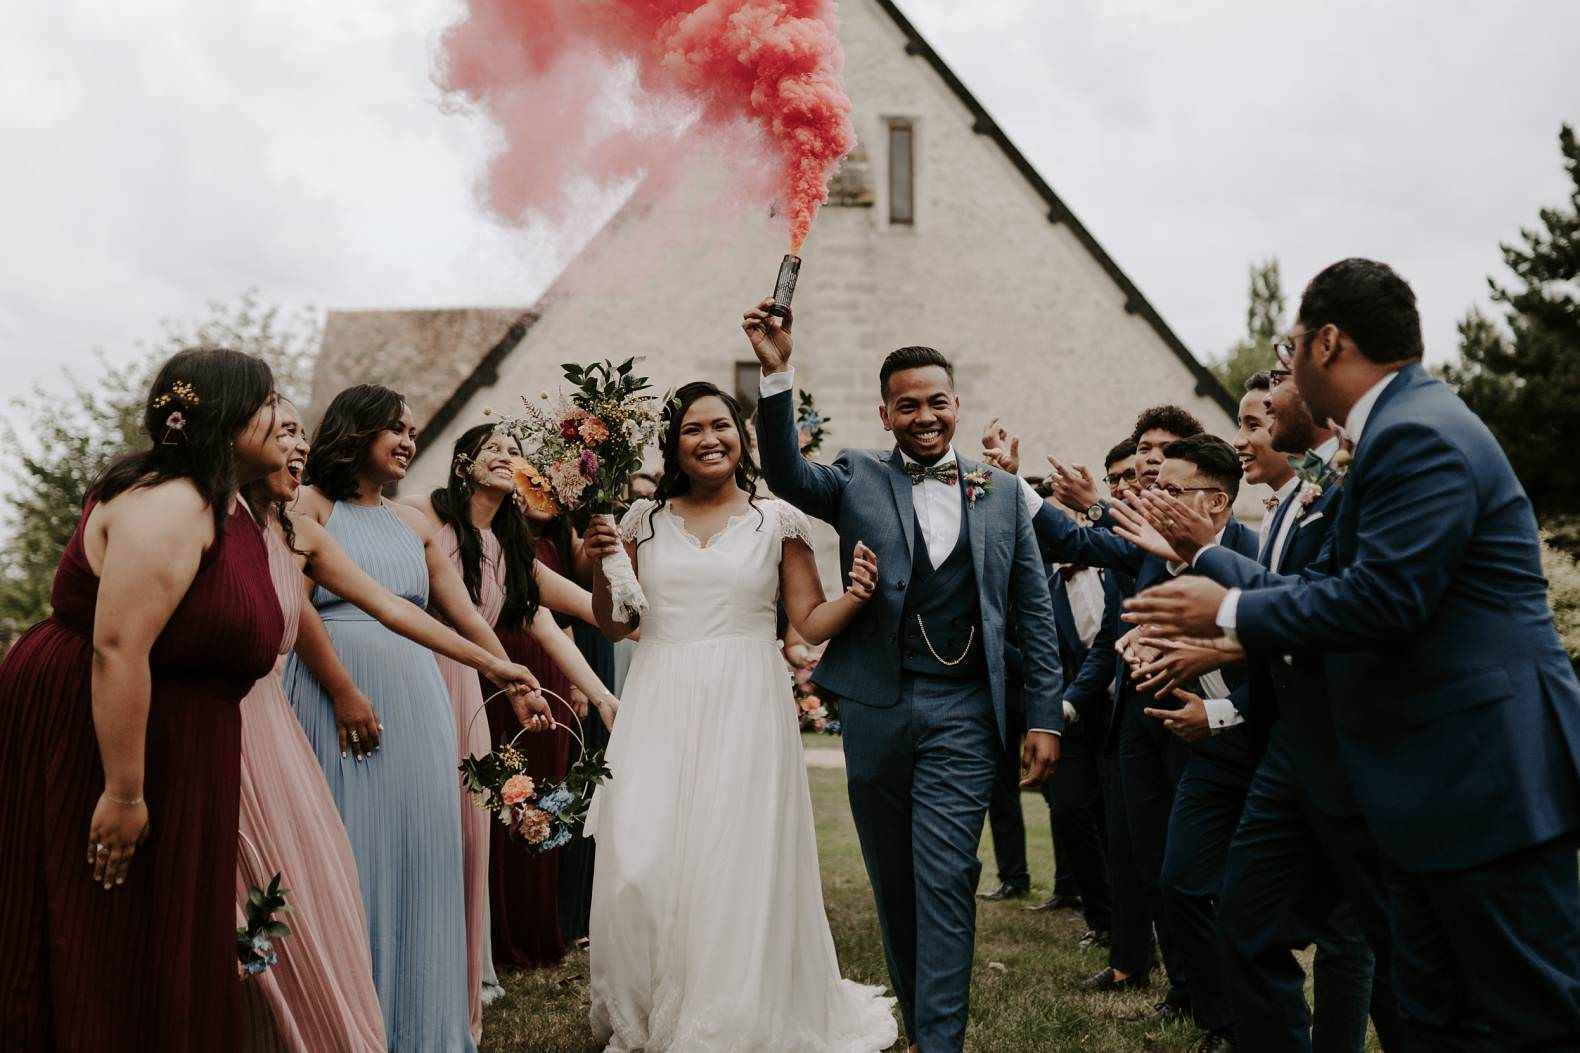 mariage manoir de corny photographe bel esprit 0048 1